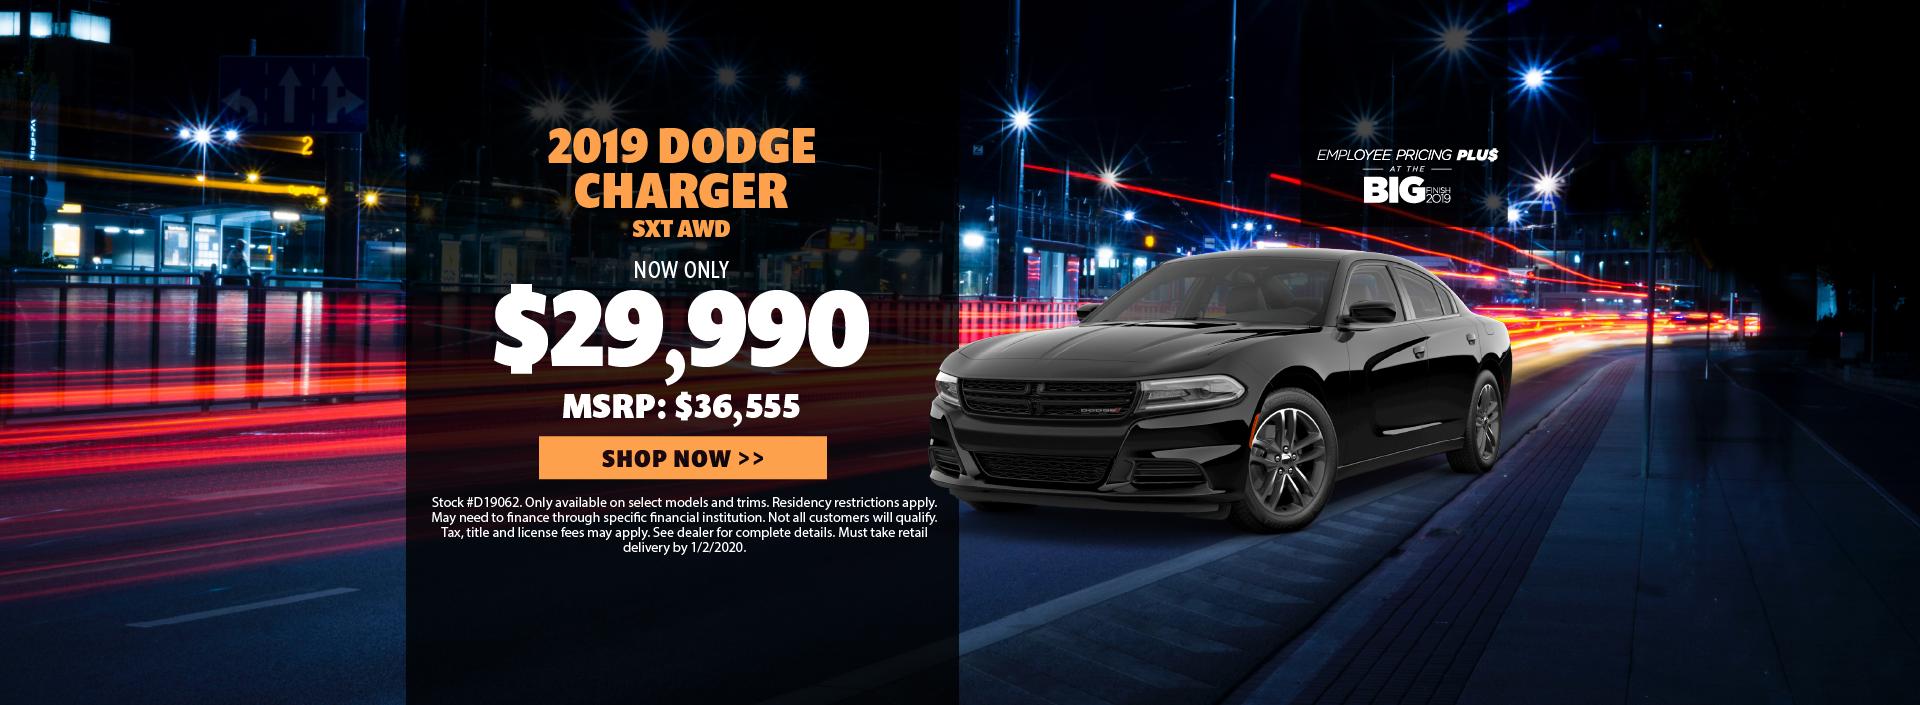 2019 Dodge Charger Offer